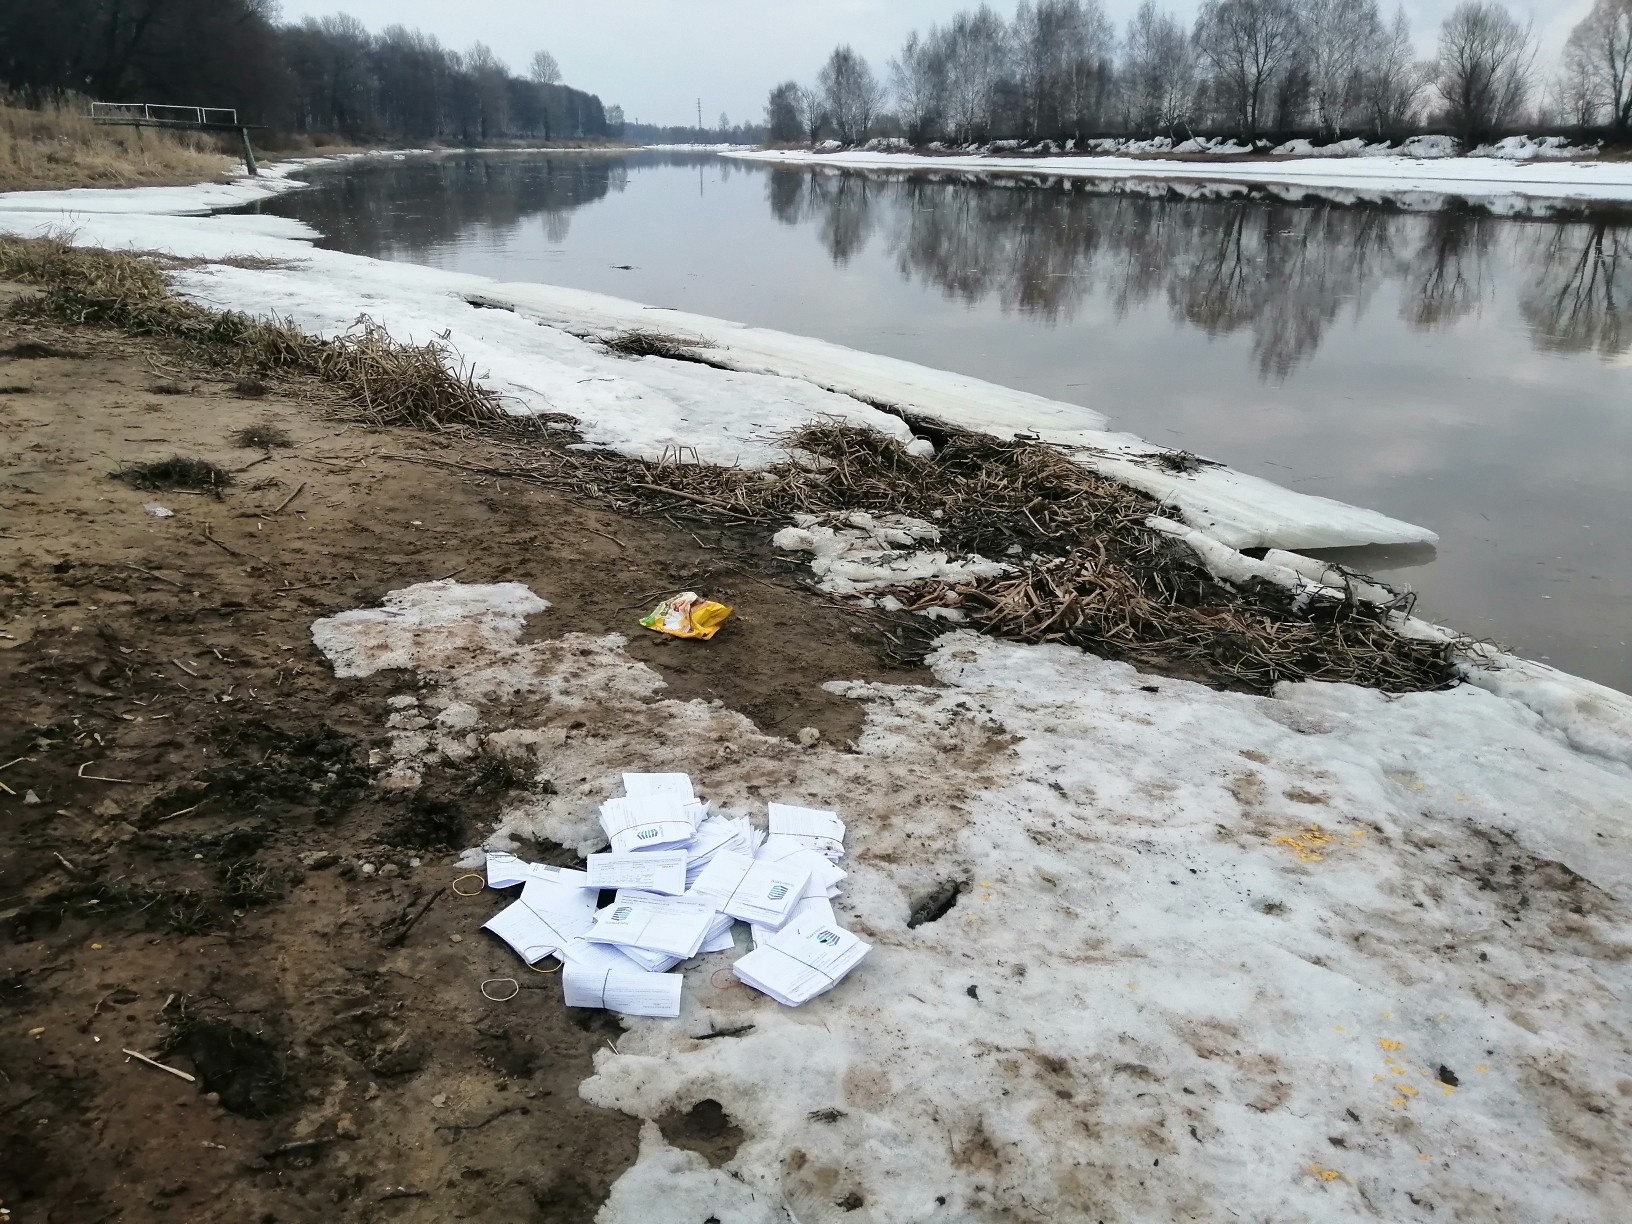 Власти разбираются, почему на берегу реки оказались квитанции за ЖКУ